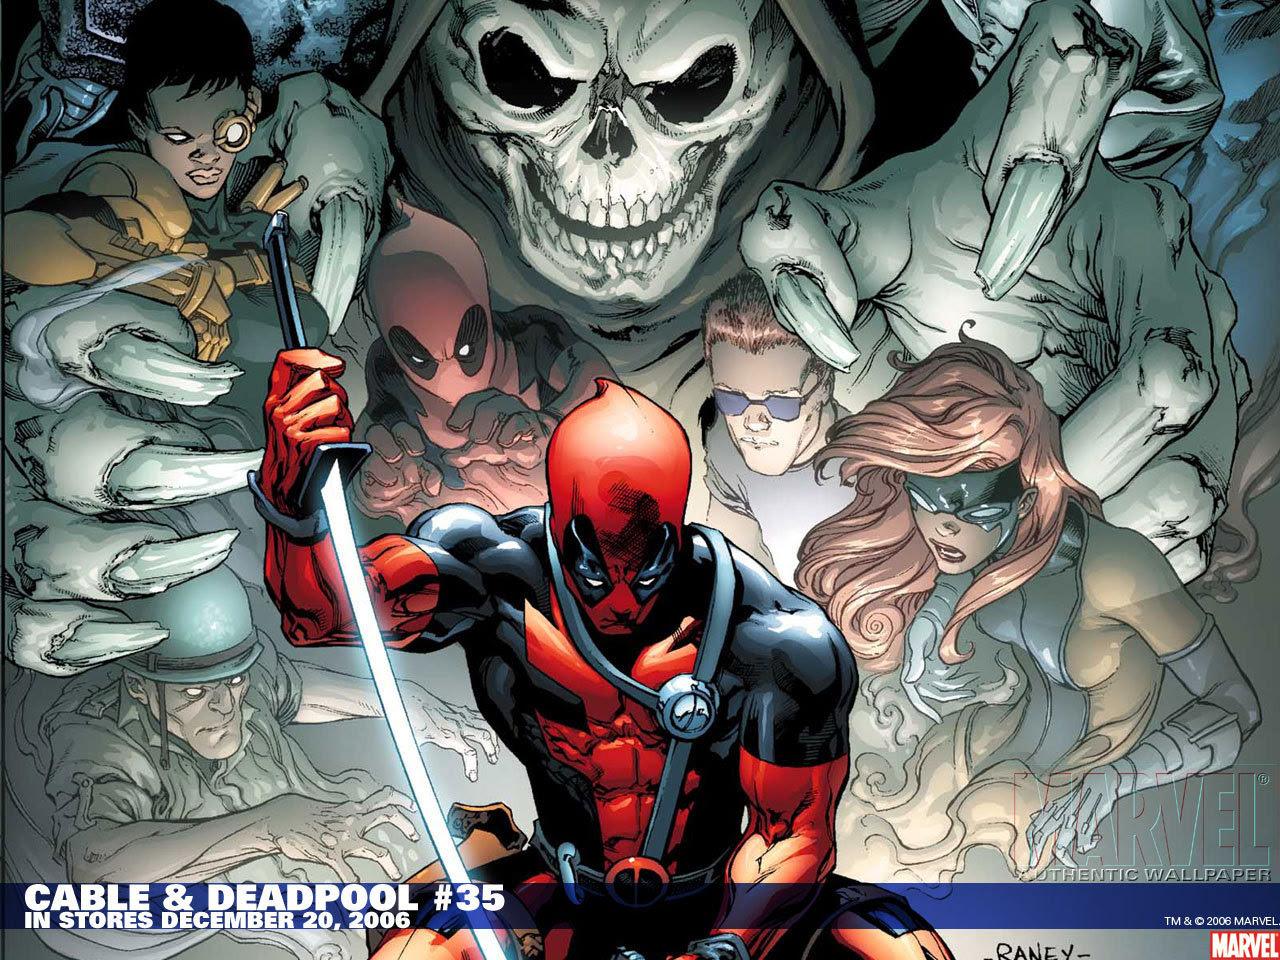 Unduh 8000+ Wallpaper Animasi Deadpool HD Terbaik